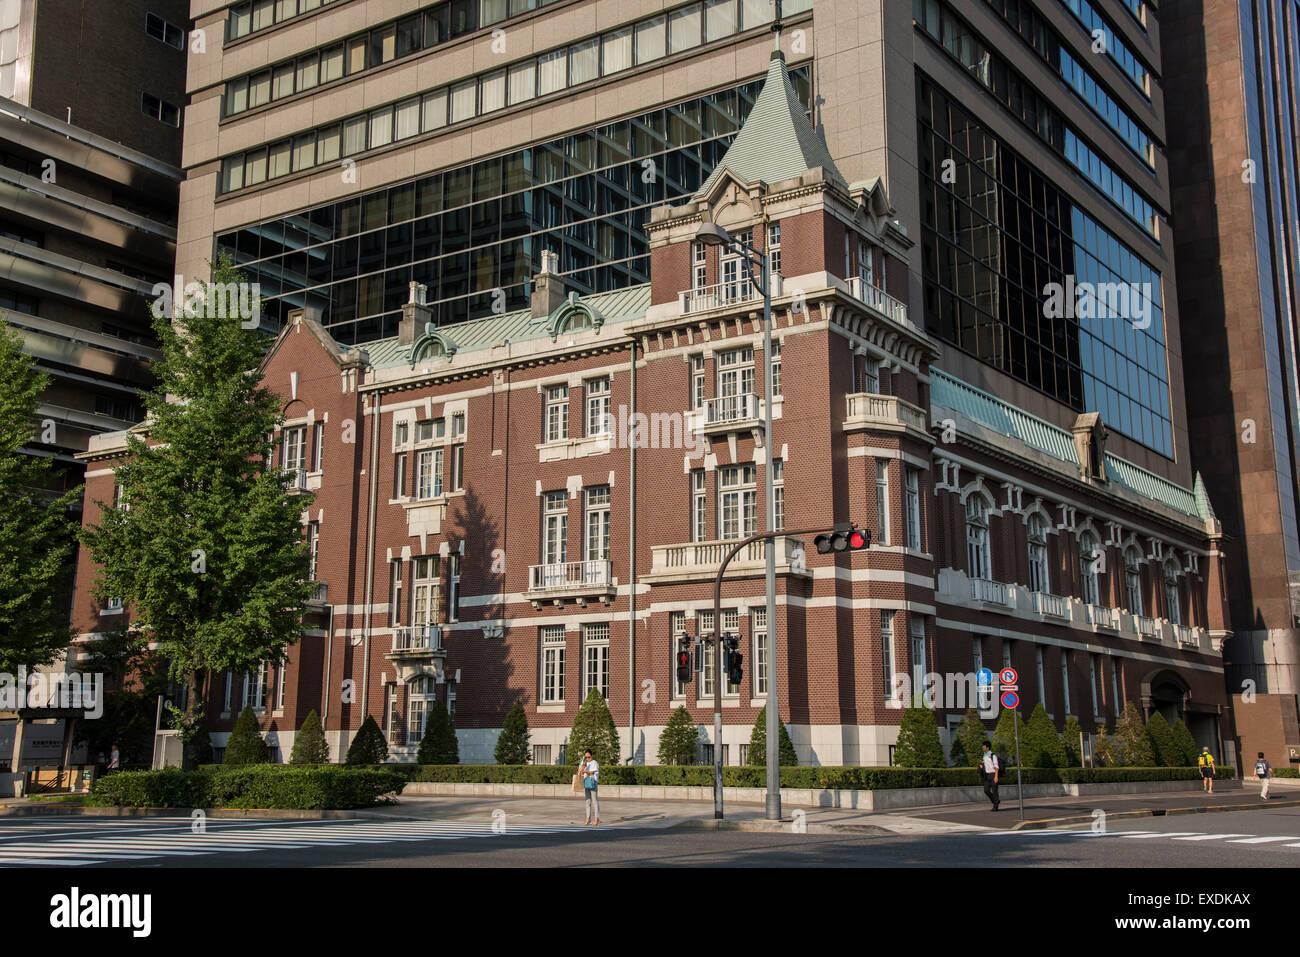 The Bankers Club,Chiyoda-Ku,Tokyo,Japan - Stock Image